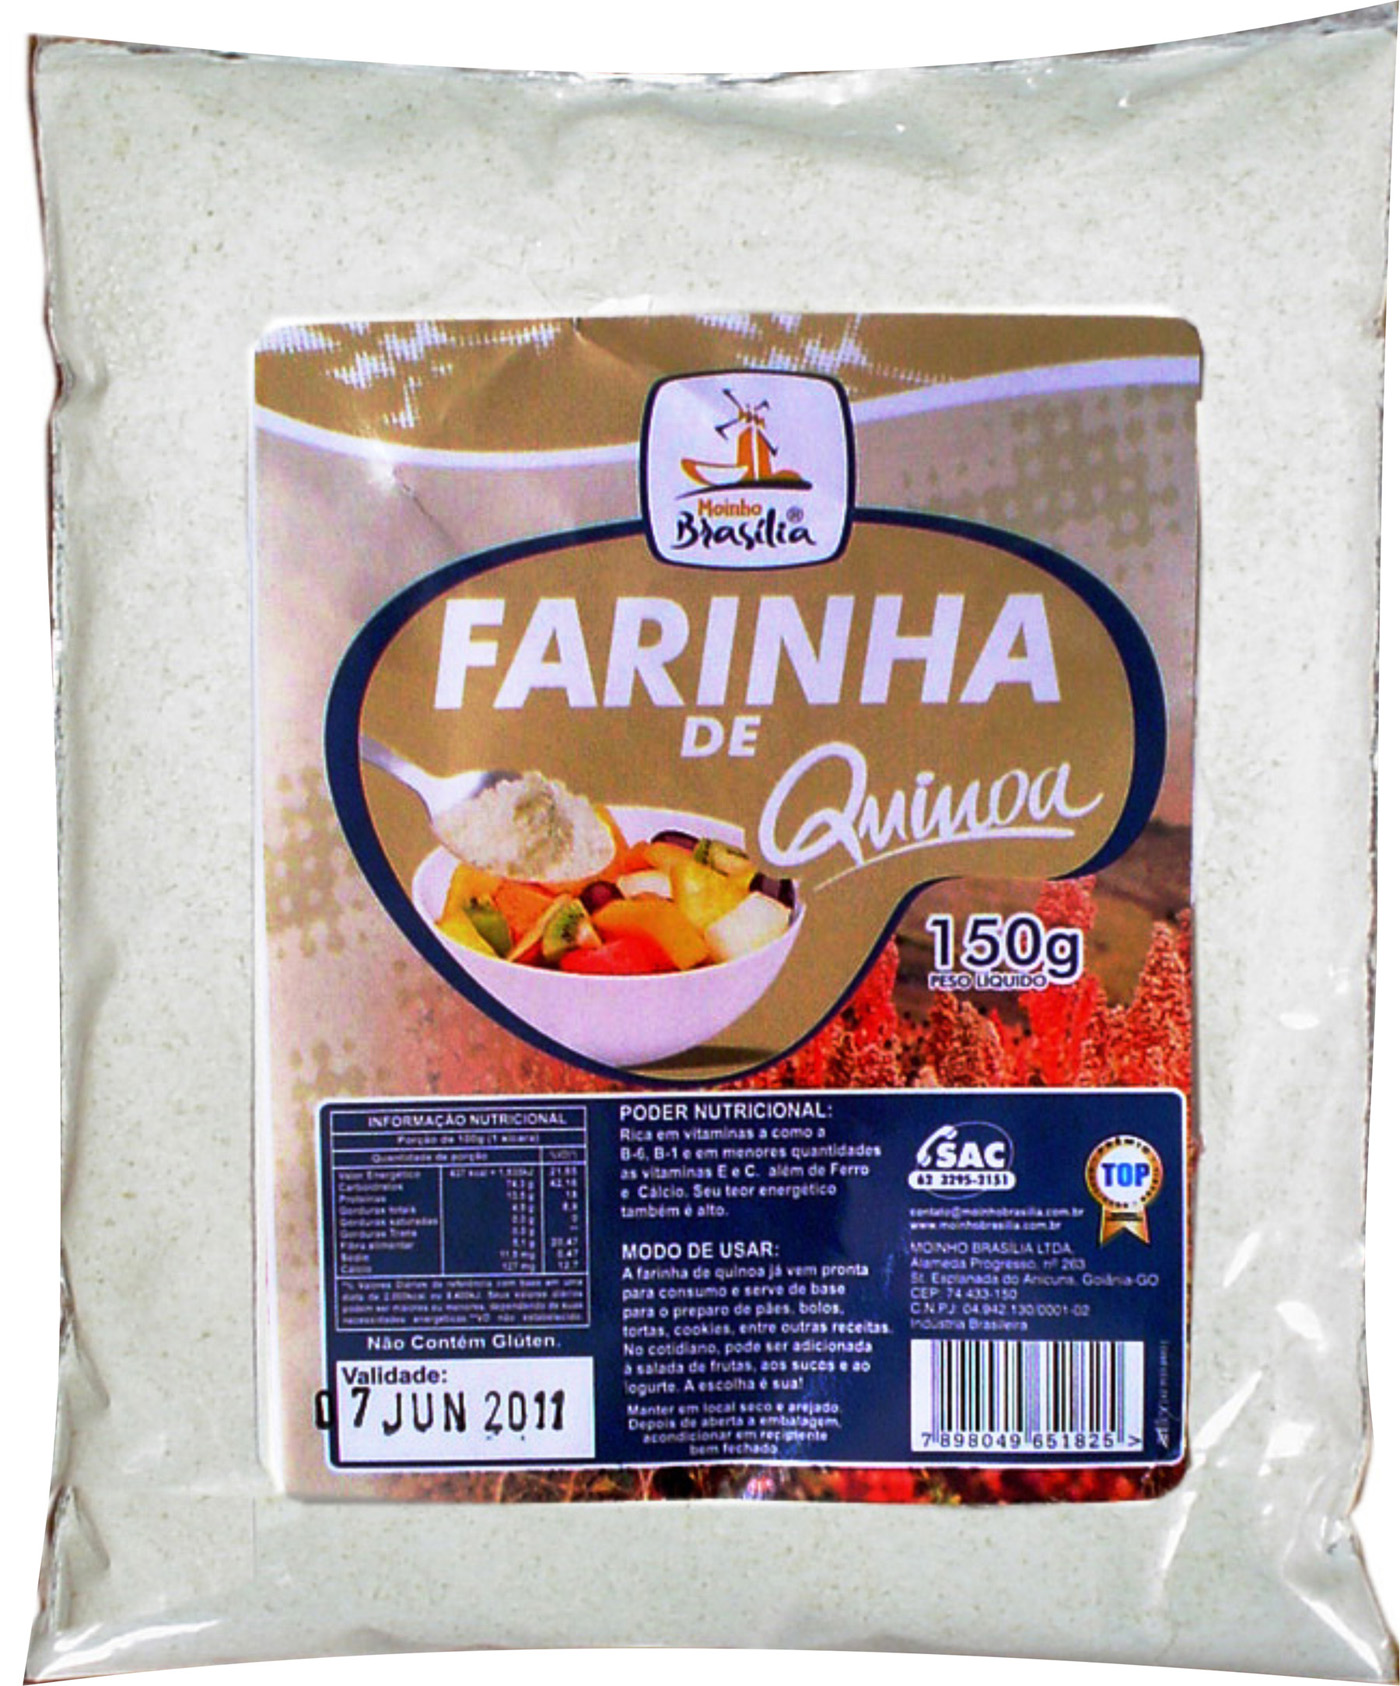 Cod.345-Farinha de  quinoa 150g